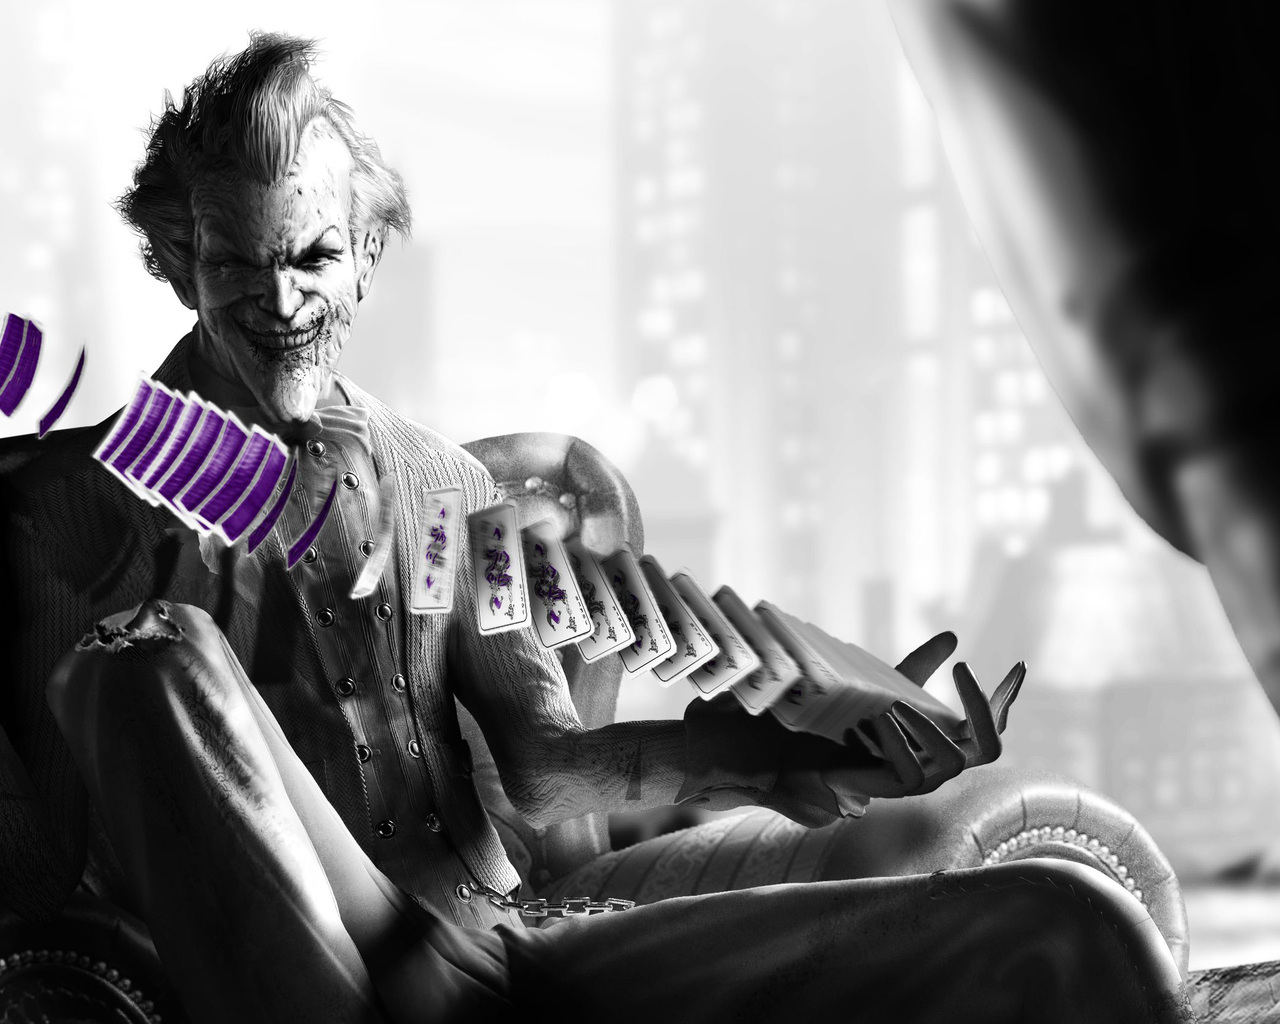 joker-playing-with-cards-monochrome-3b.jpg